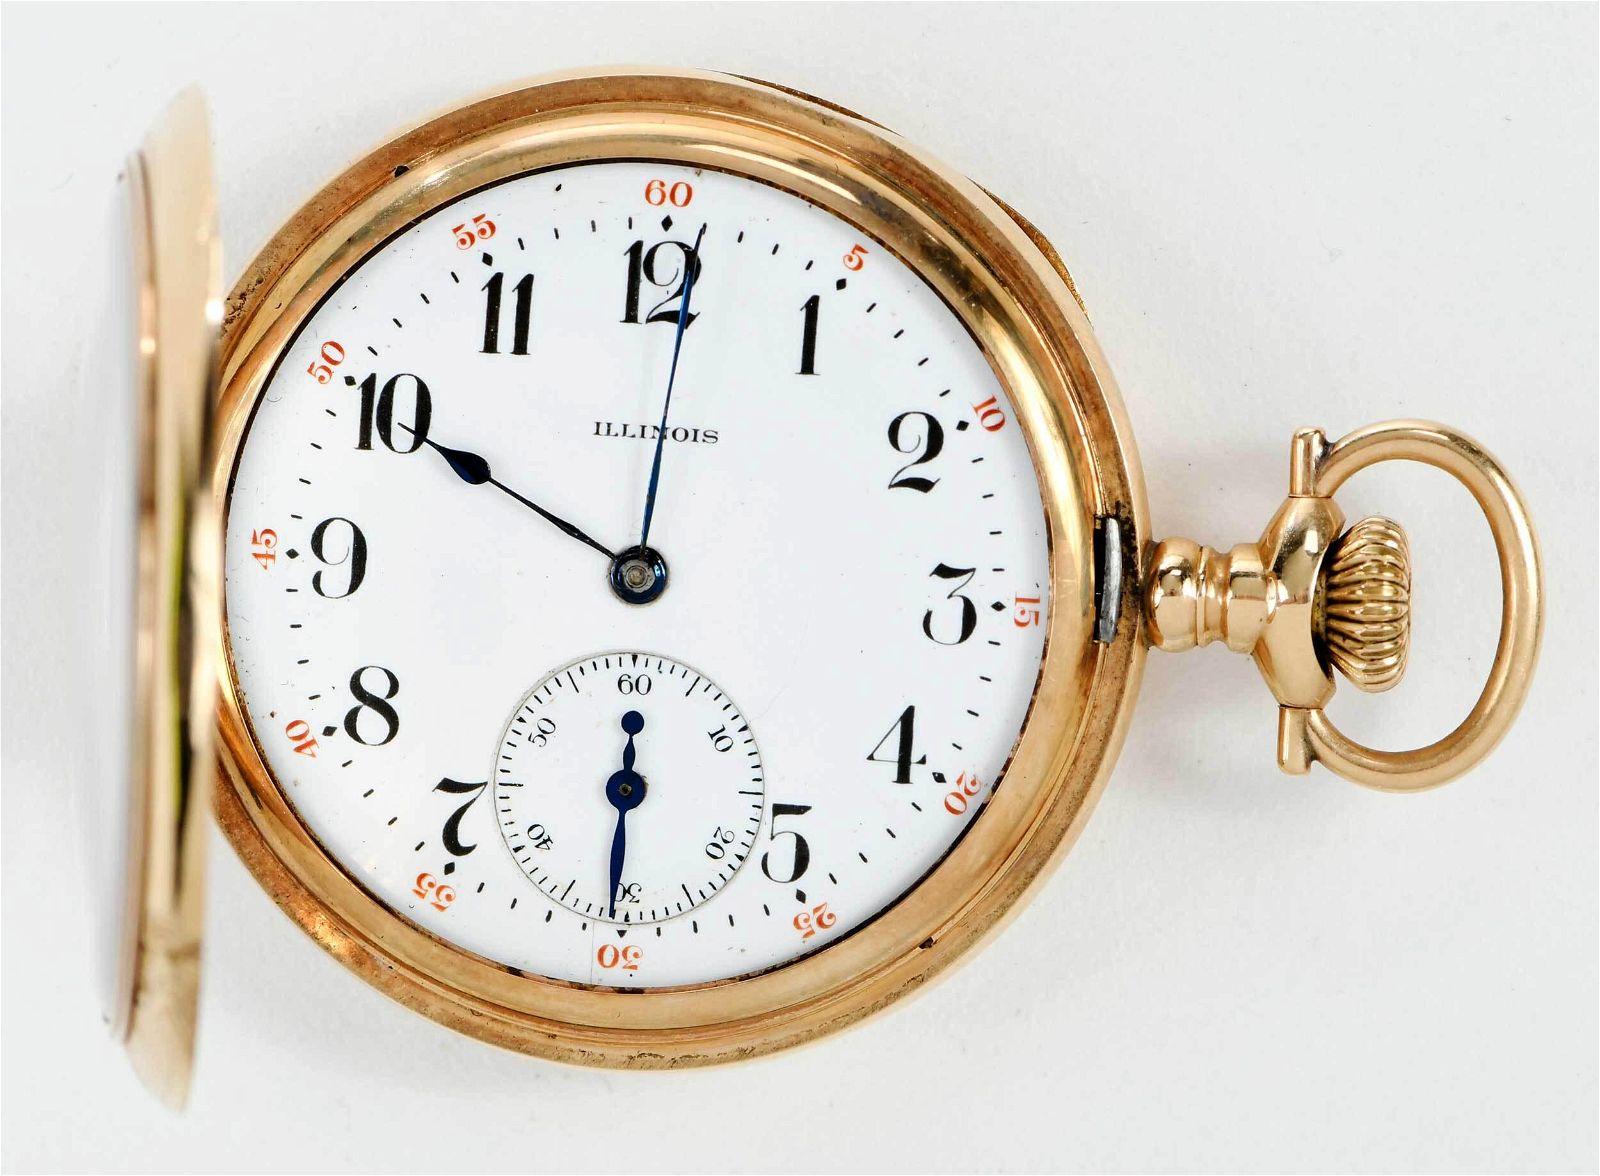 Illinois Watch Co. 14kt. Pocket Watch